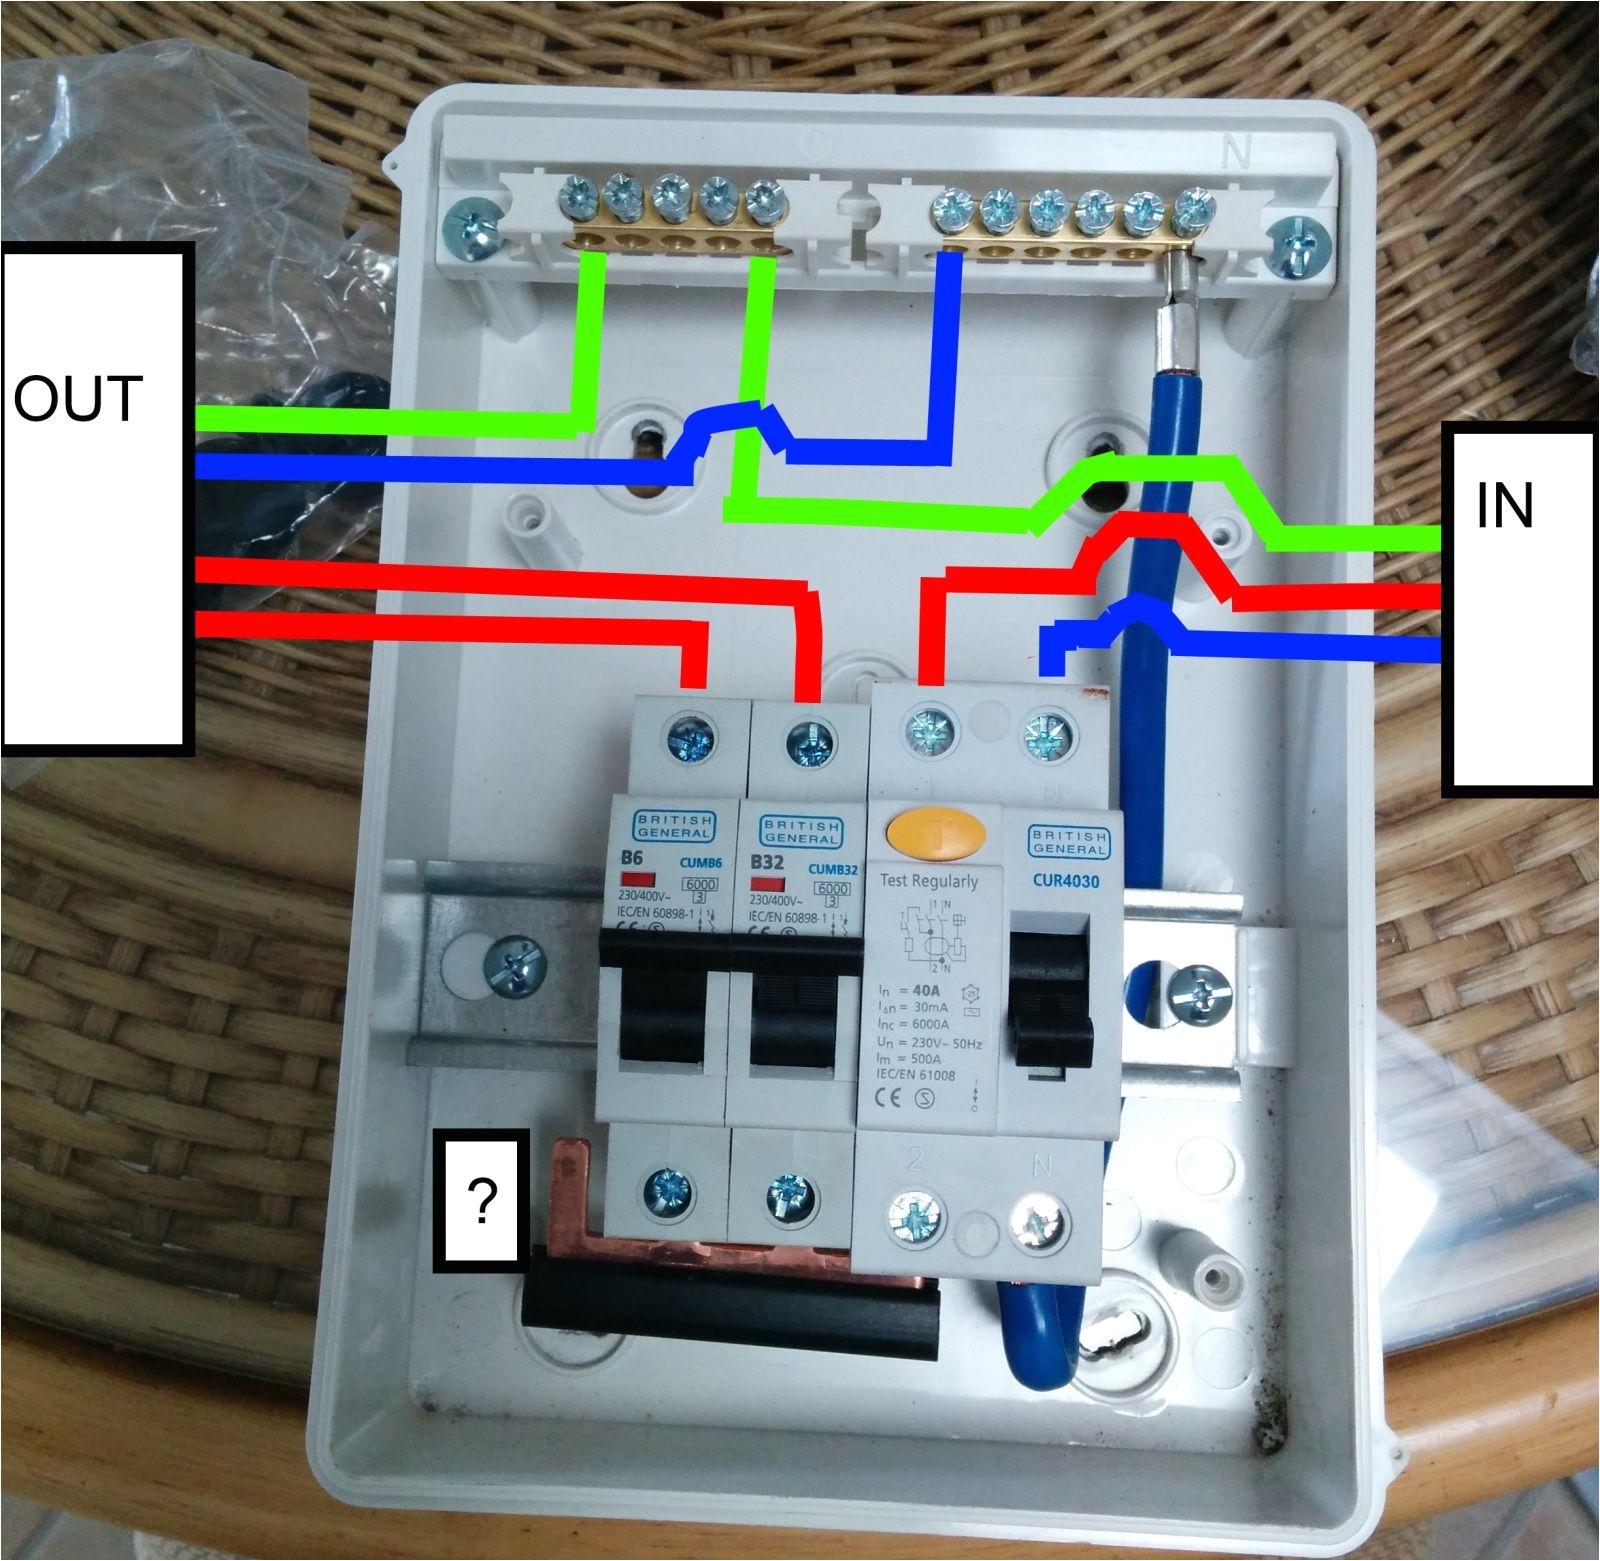 wiring diagram for a garage consumer unit wiring diagrams konsult lap garage unit wiring diagram